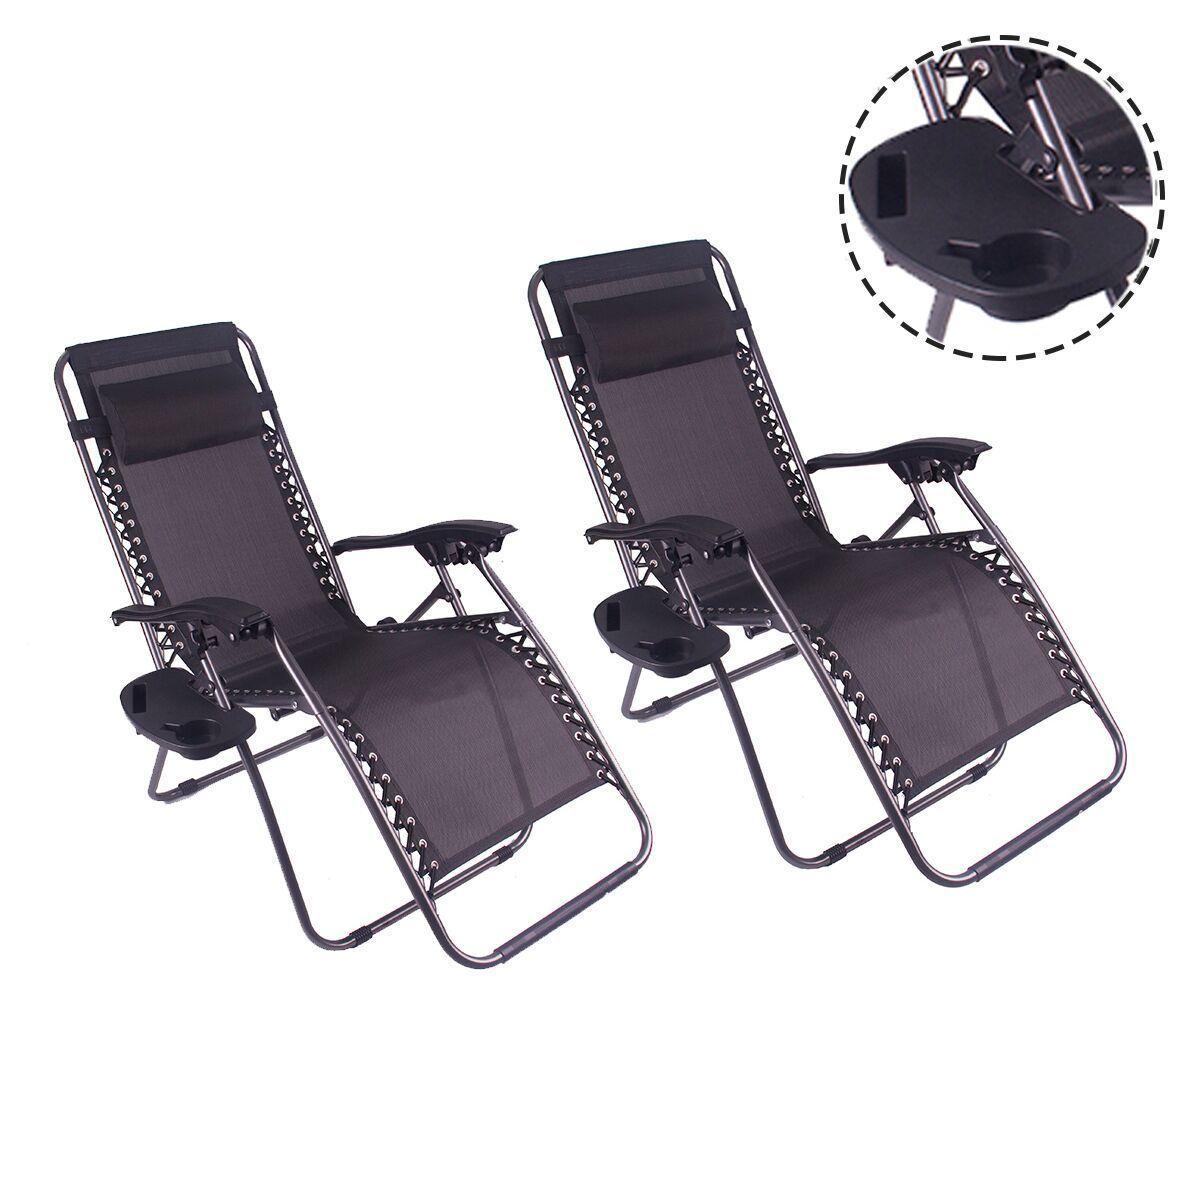 Outdoor Zero Gravity Lounge Chair Beach Patio Yard Folding